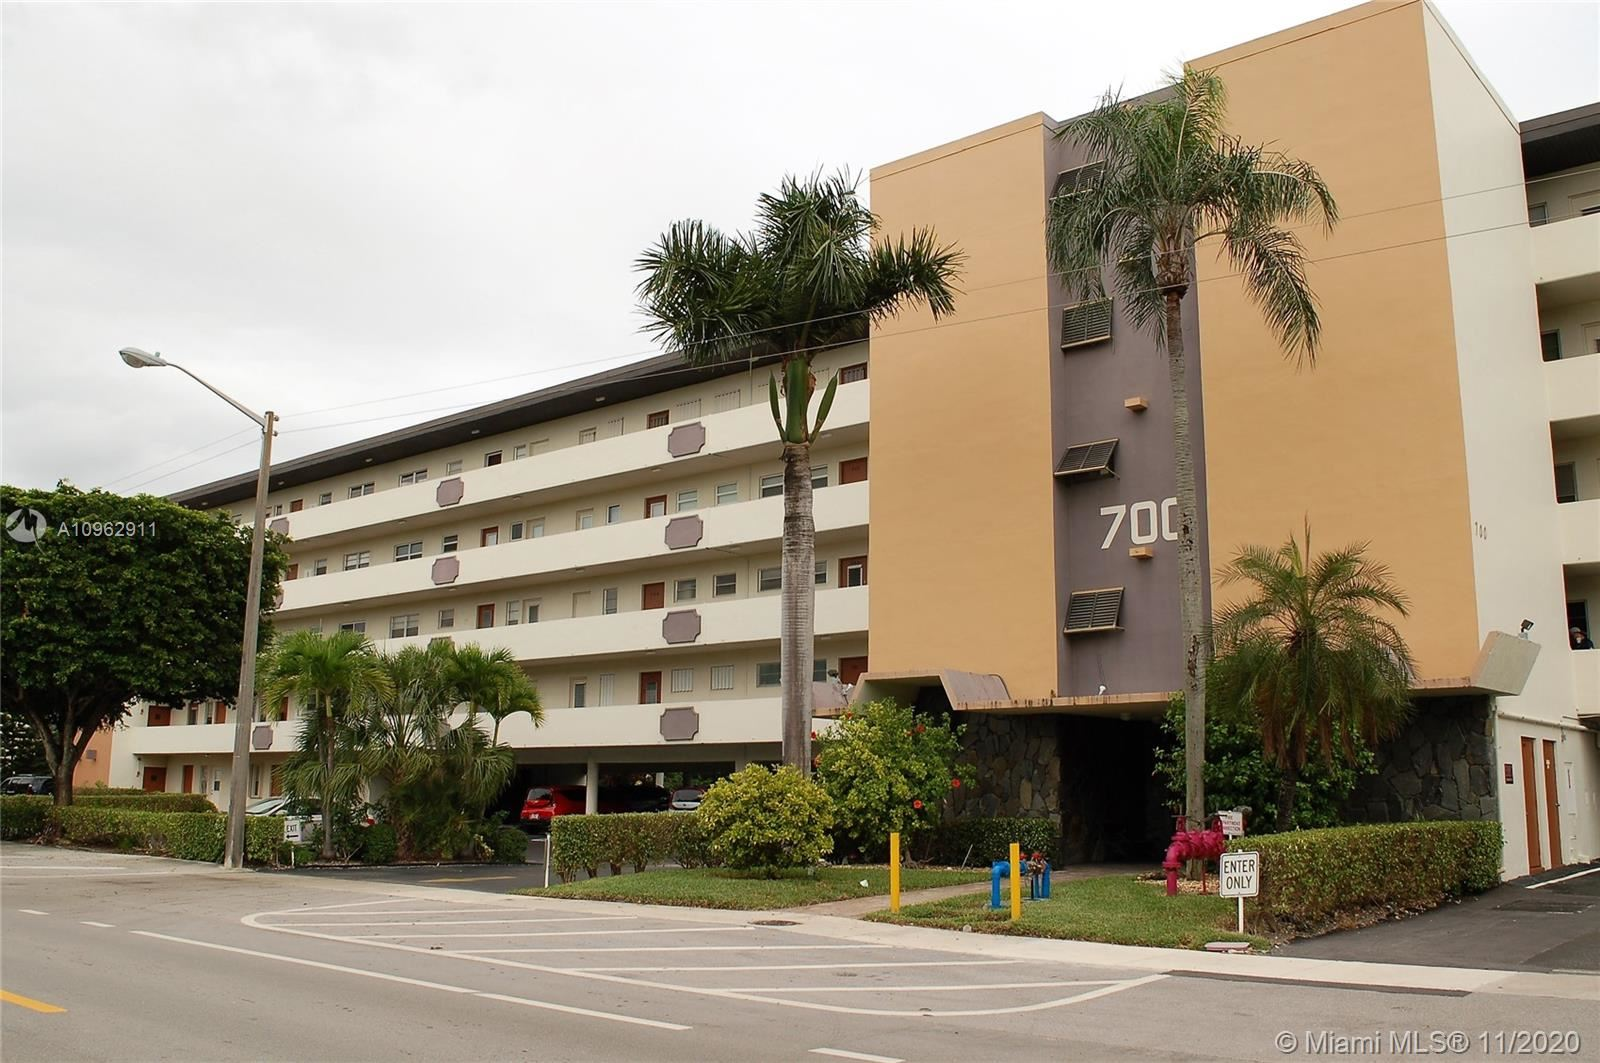 Photo of 700 NE 14th Ave #502, Hallandale Beach, FL 33009 (MLS # A10962911)